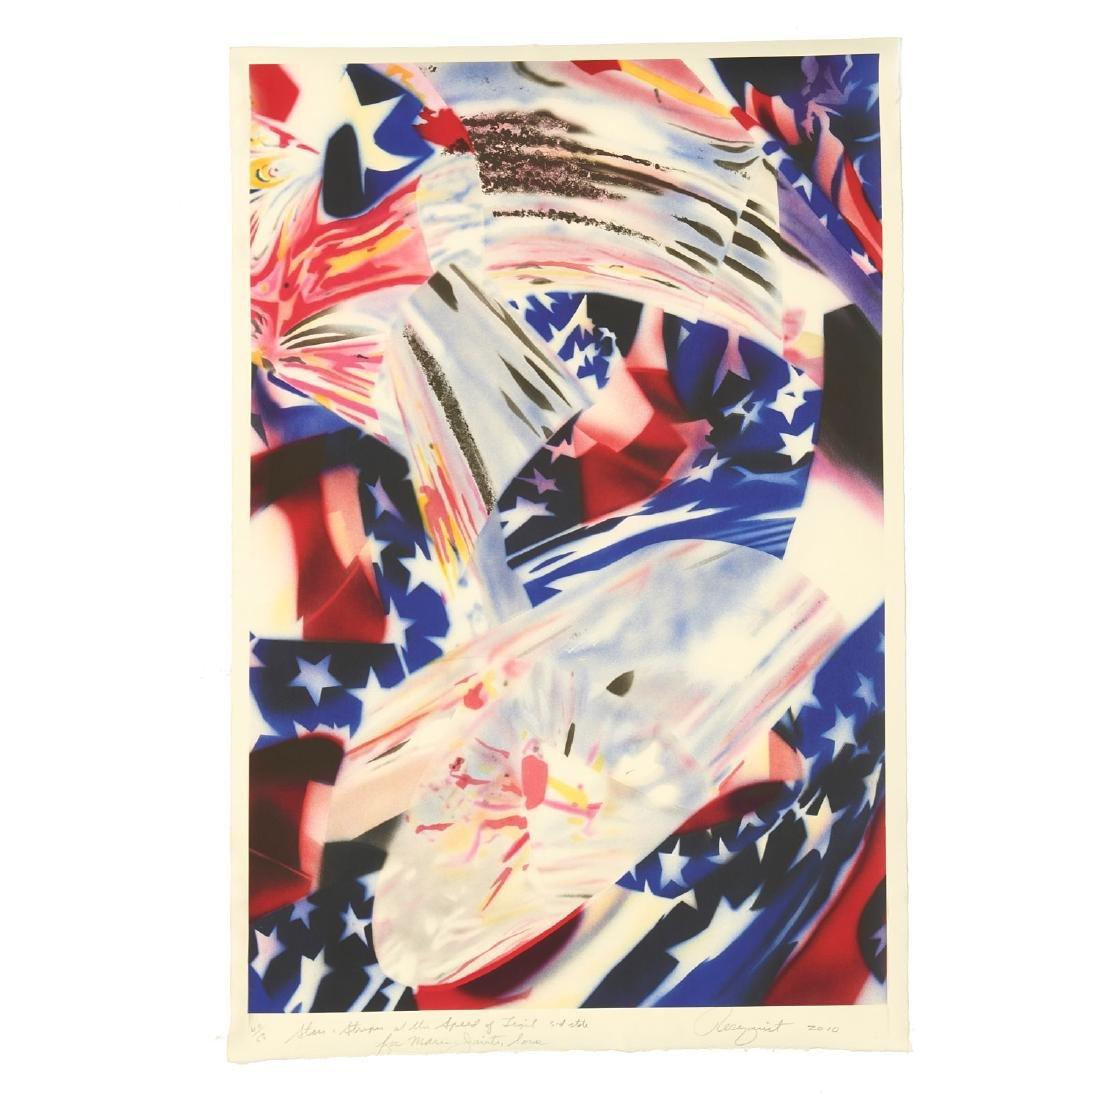 James Rosenquist, print